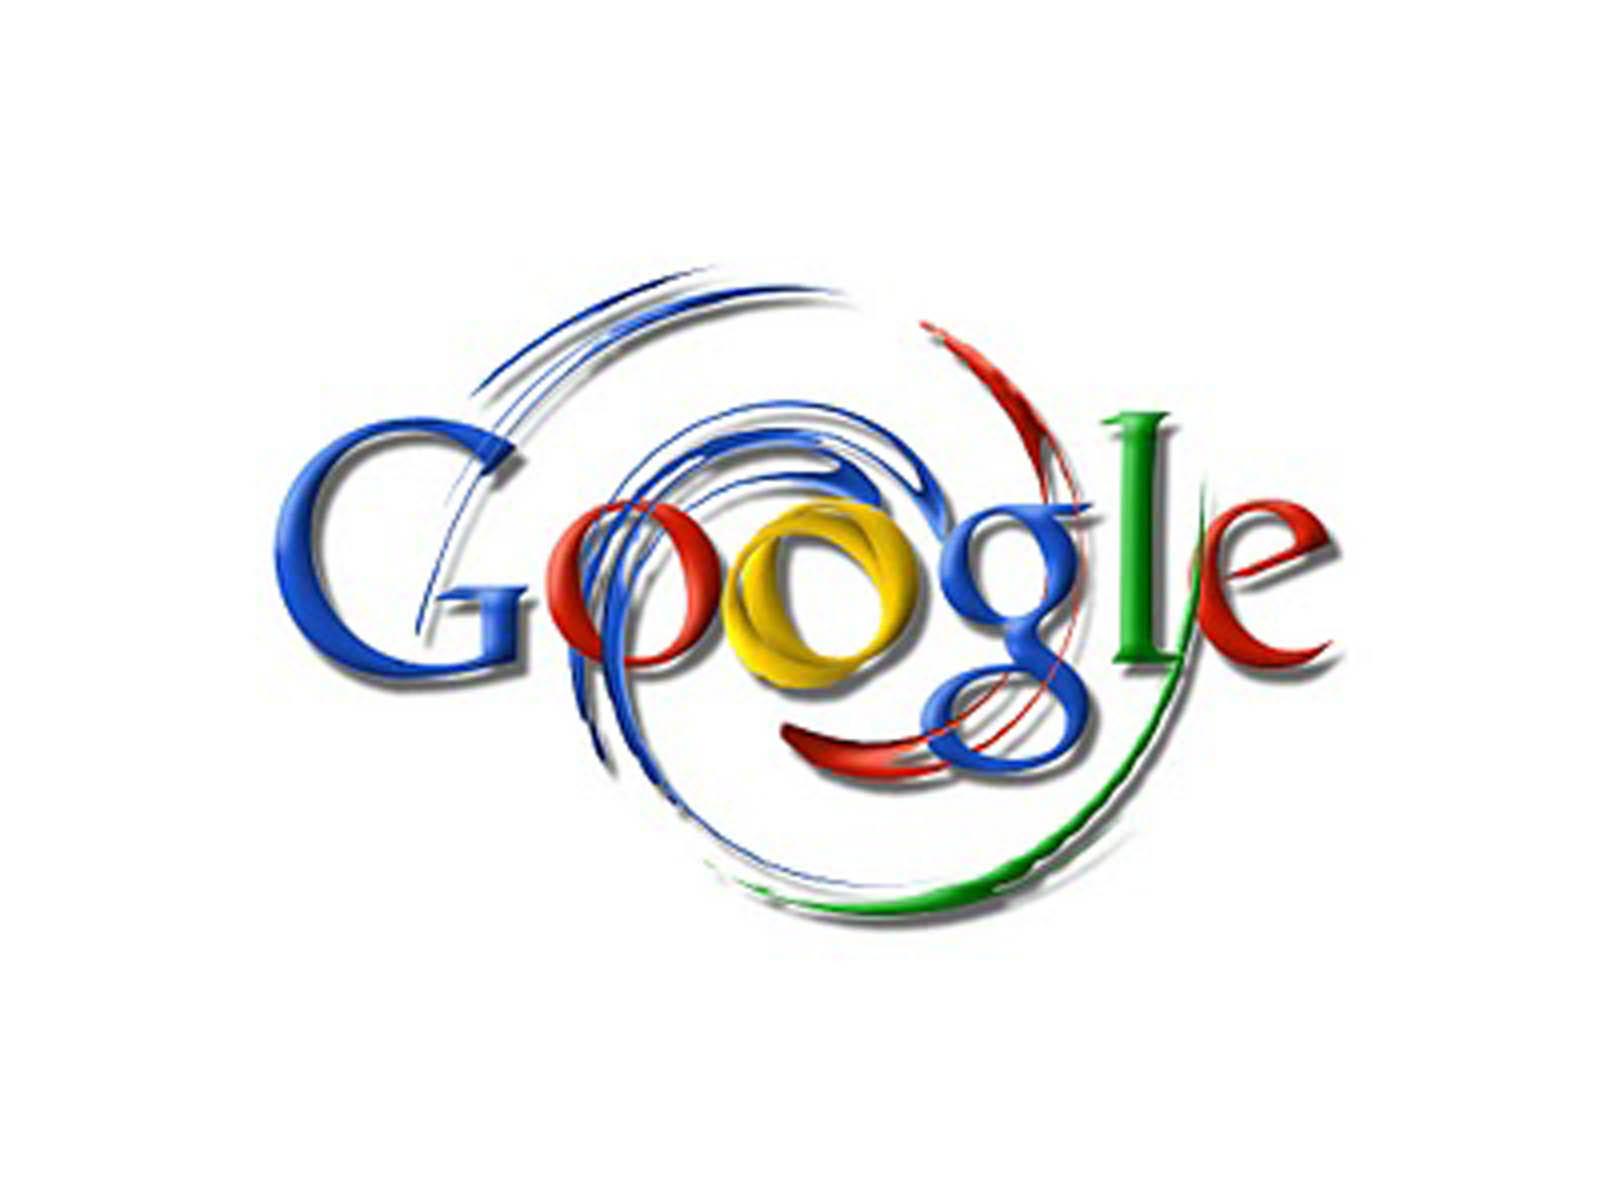 google - photo #14